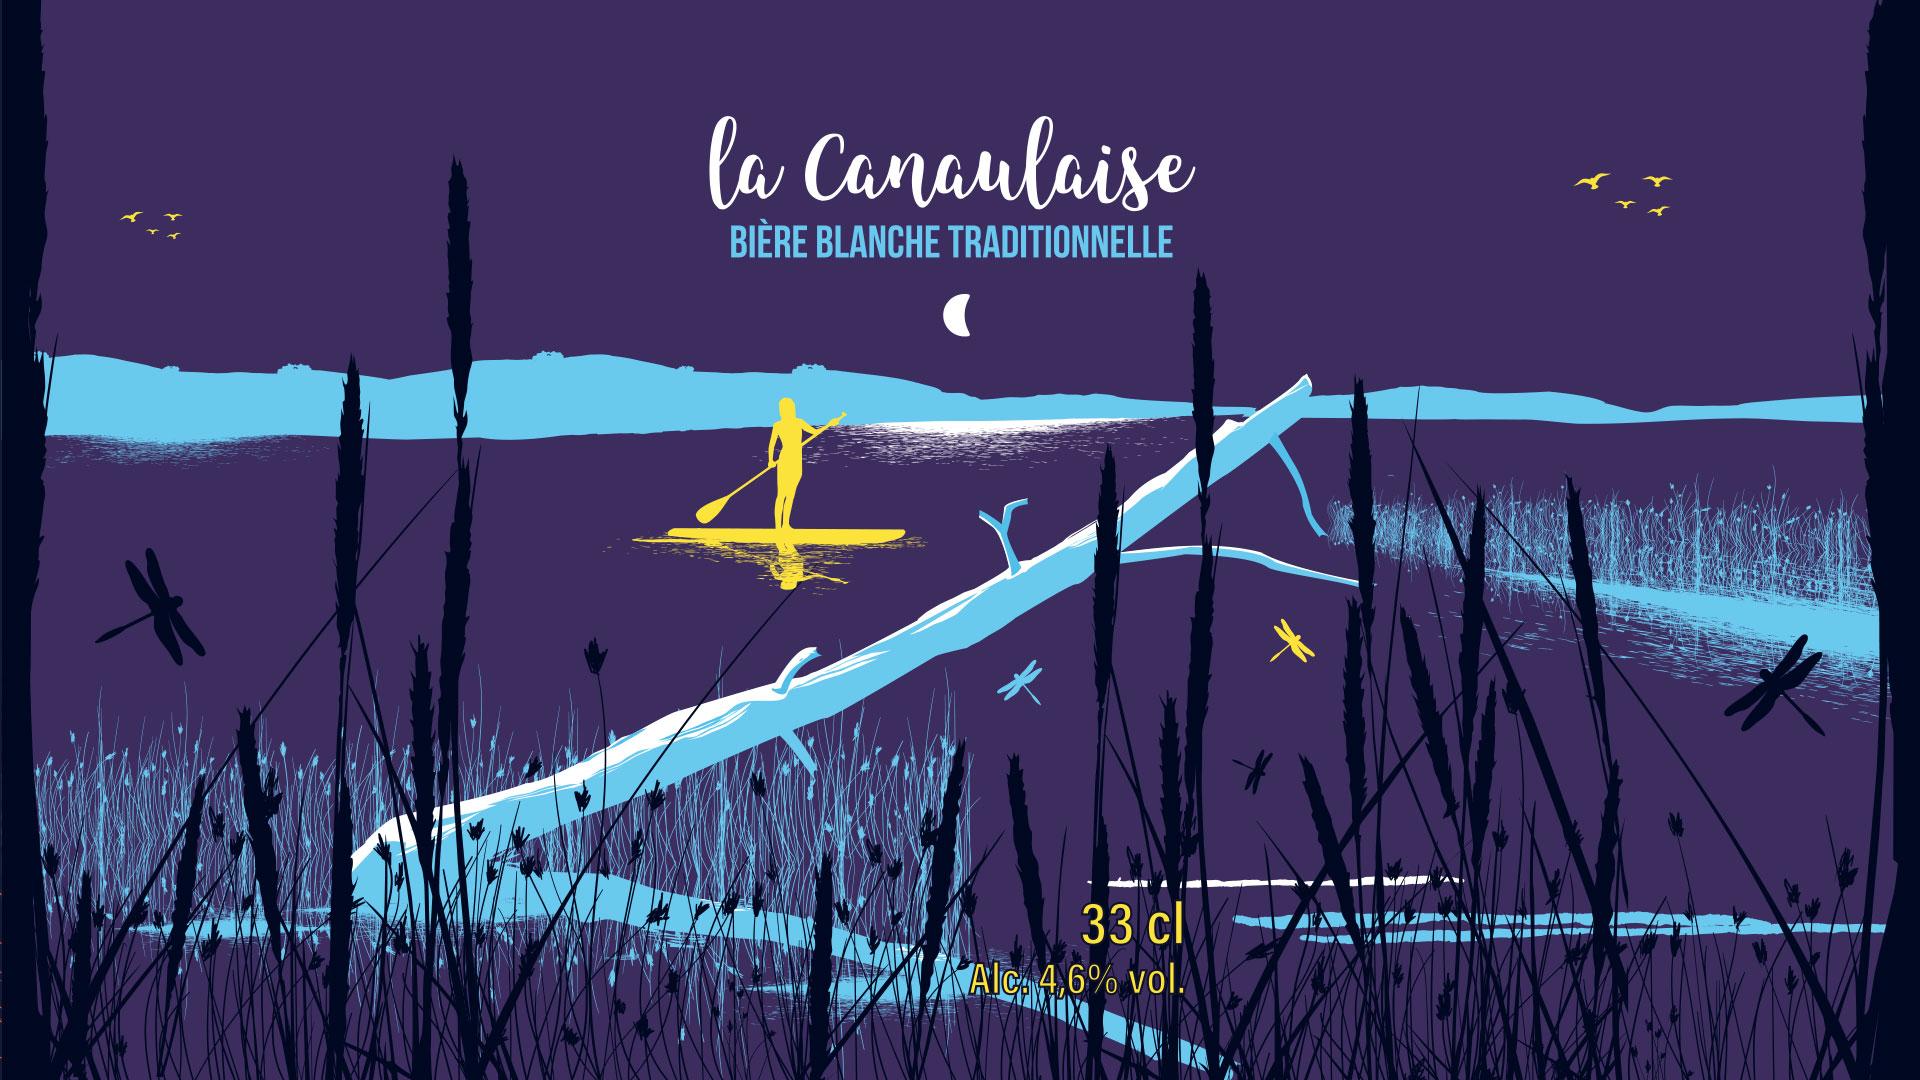 La Canaulaise Blanche